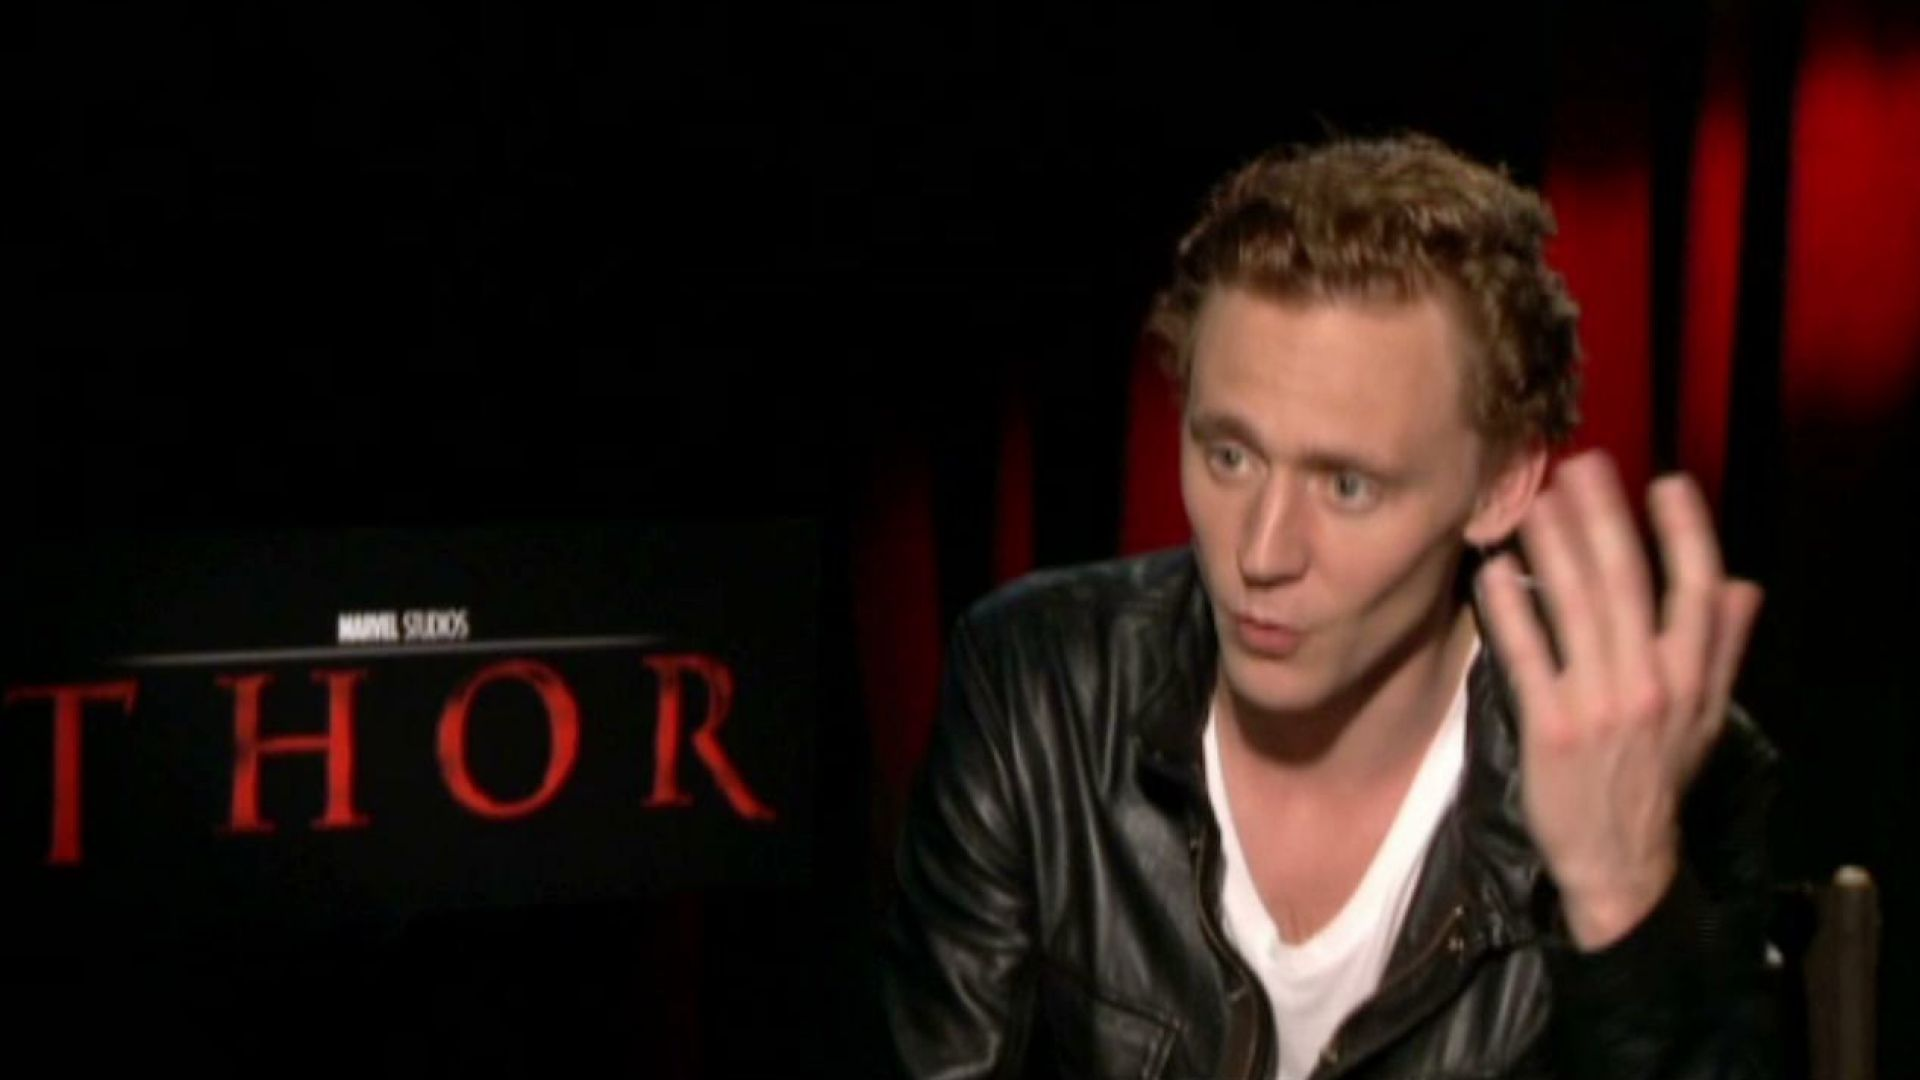 Tom Hiddleston talks about Loki in Thor (part 2)